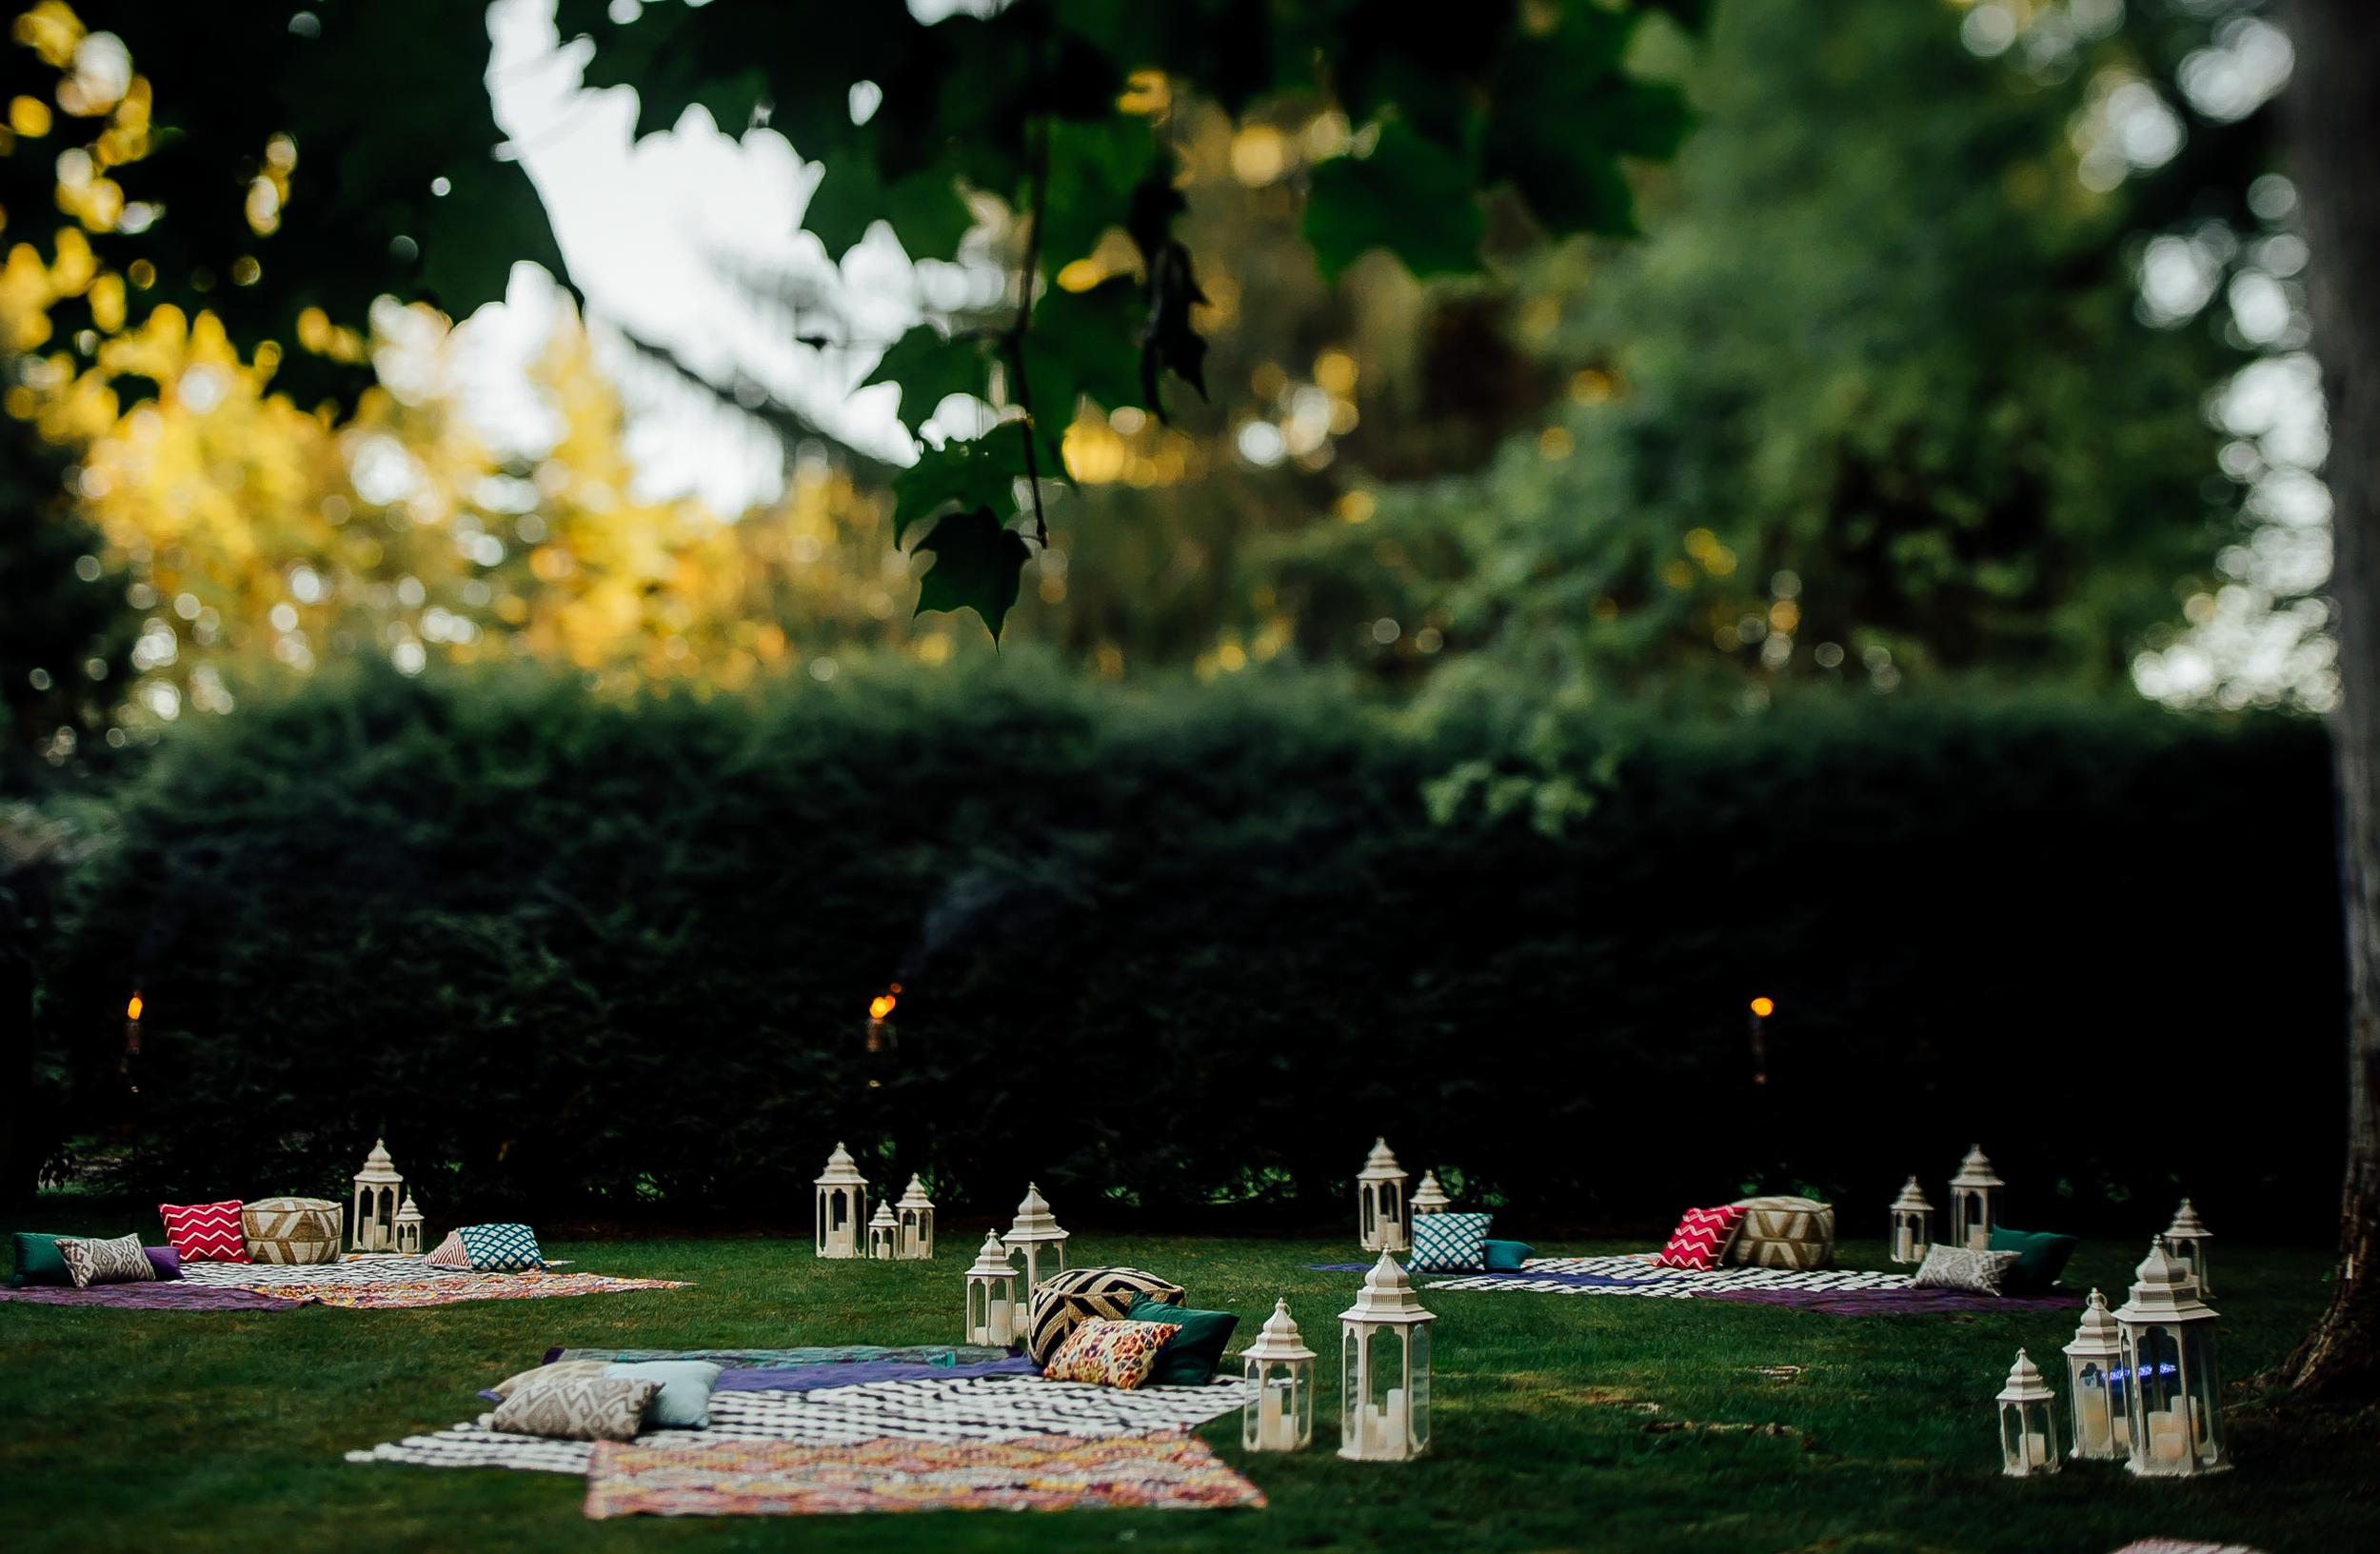 Tara Consolati is a luxury wedding planner in the Berkshires